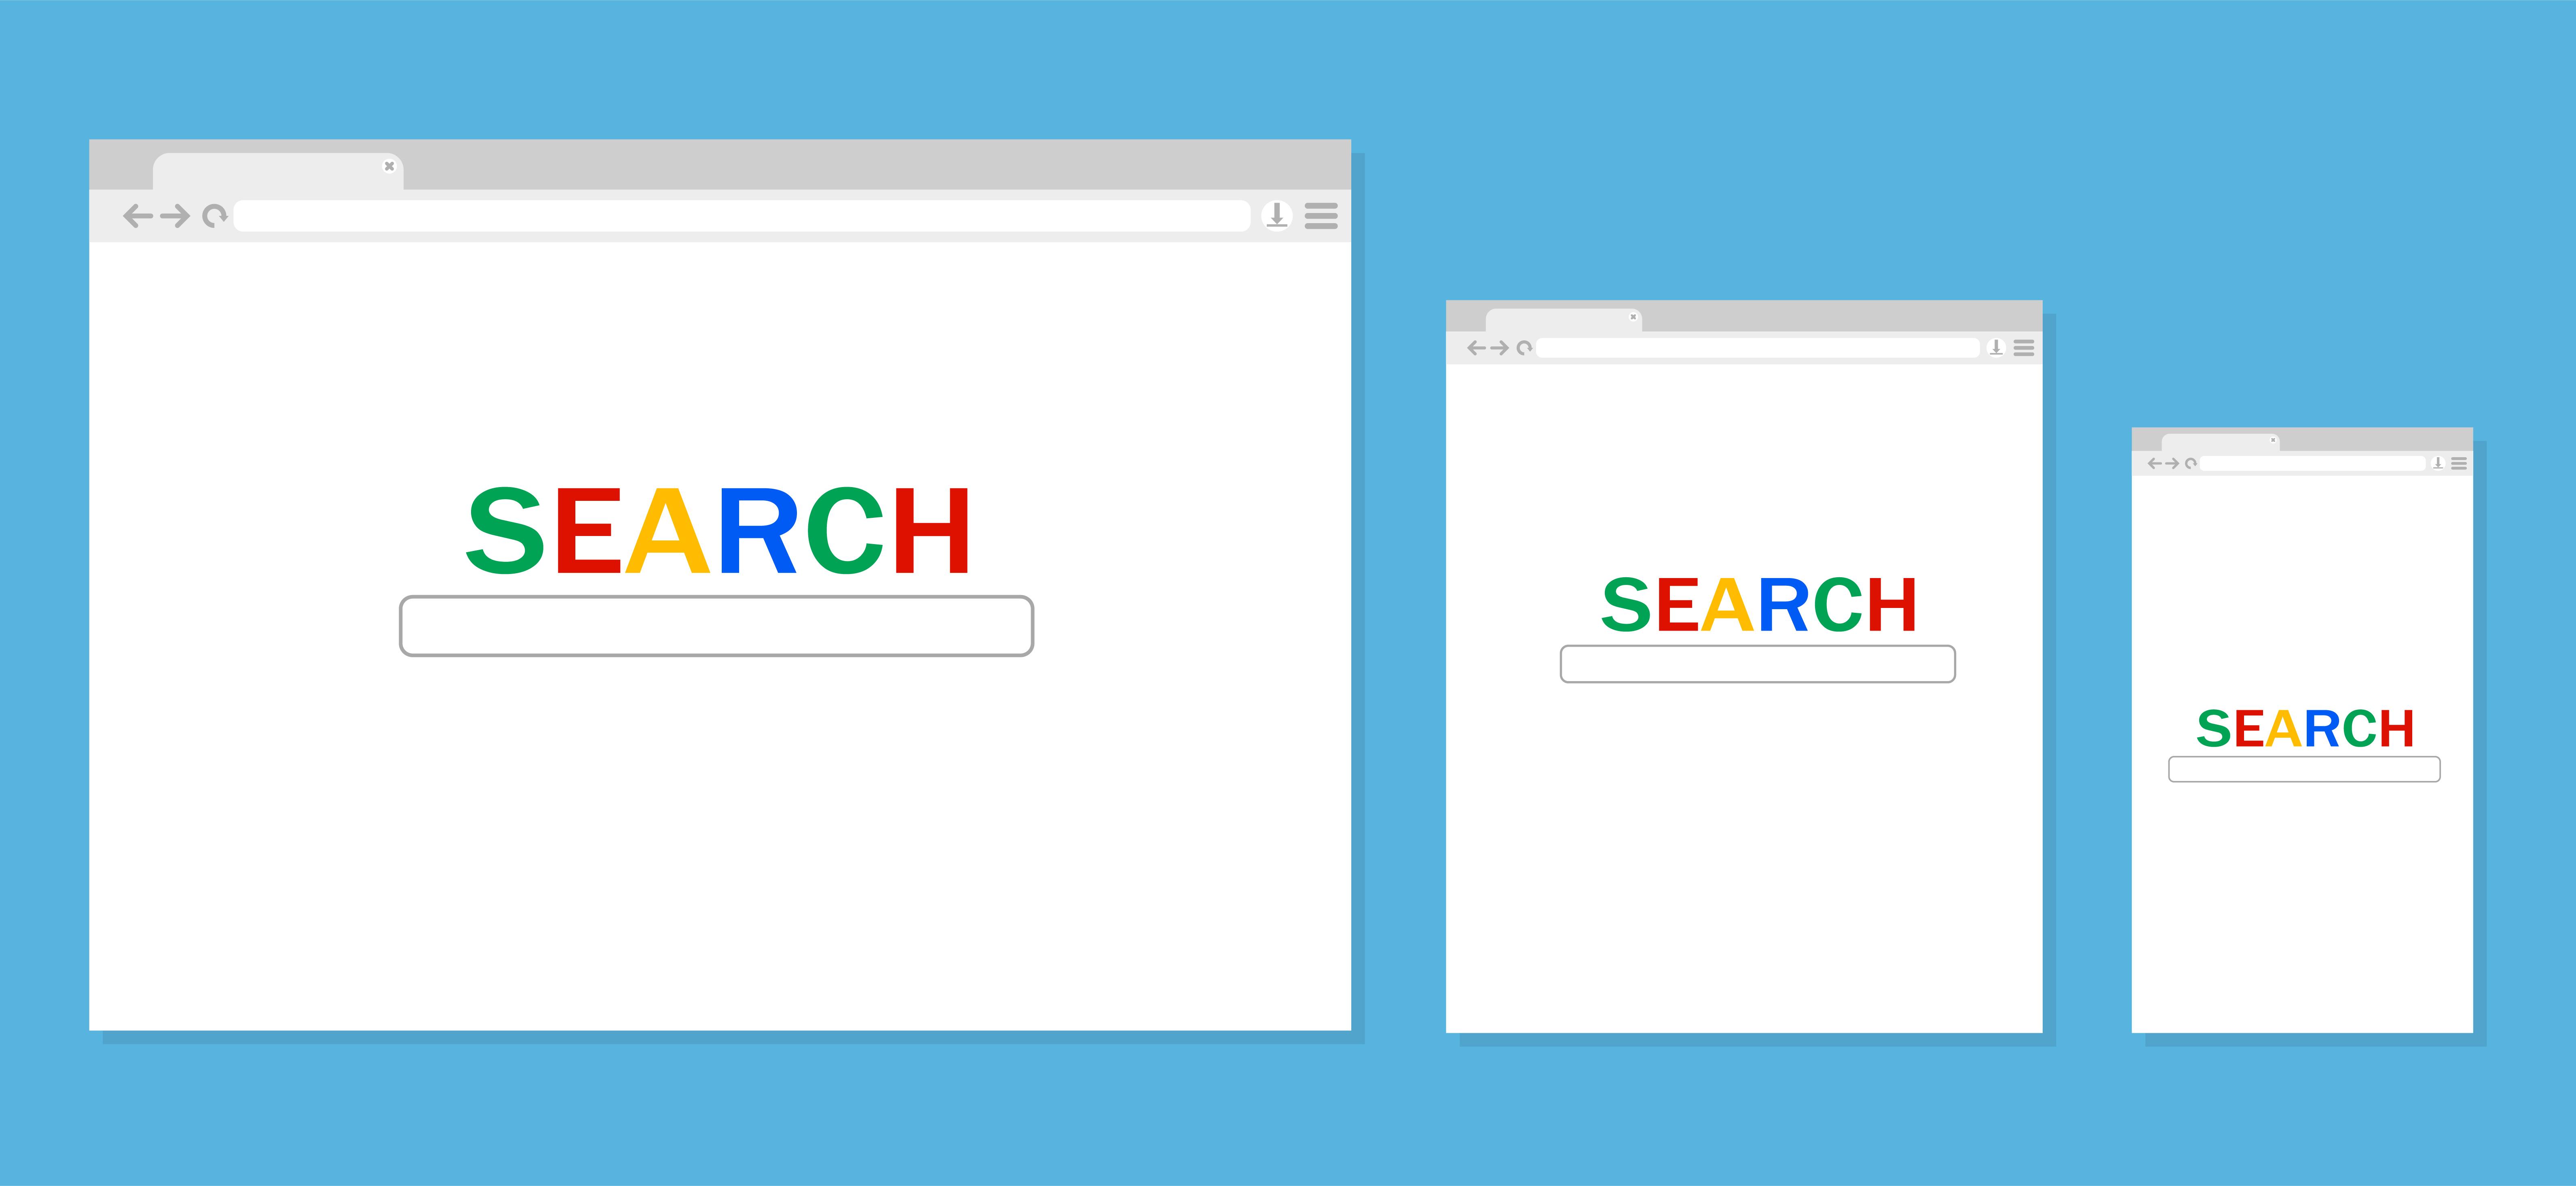 Googleの検索履歴は価値がある